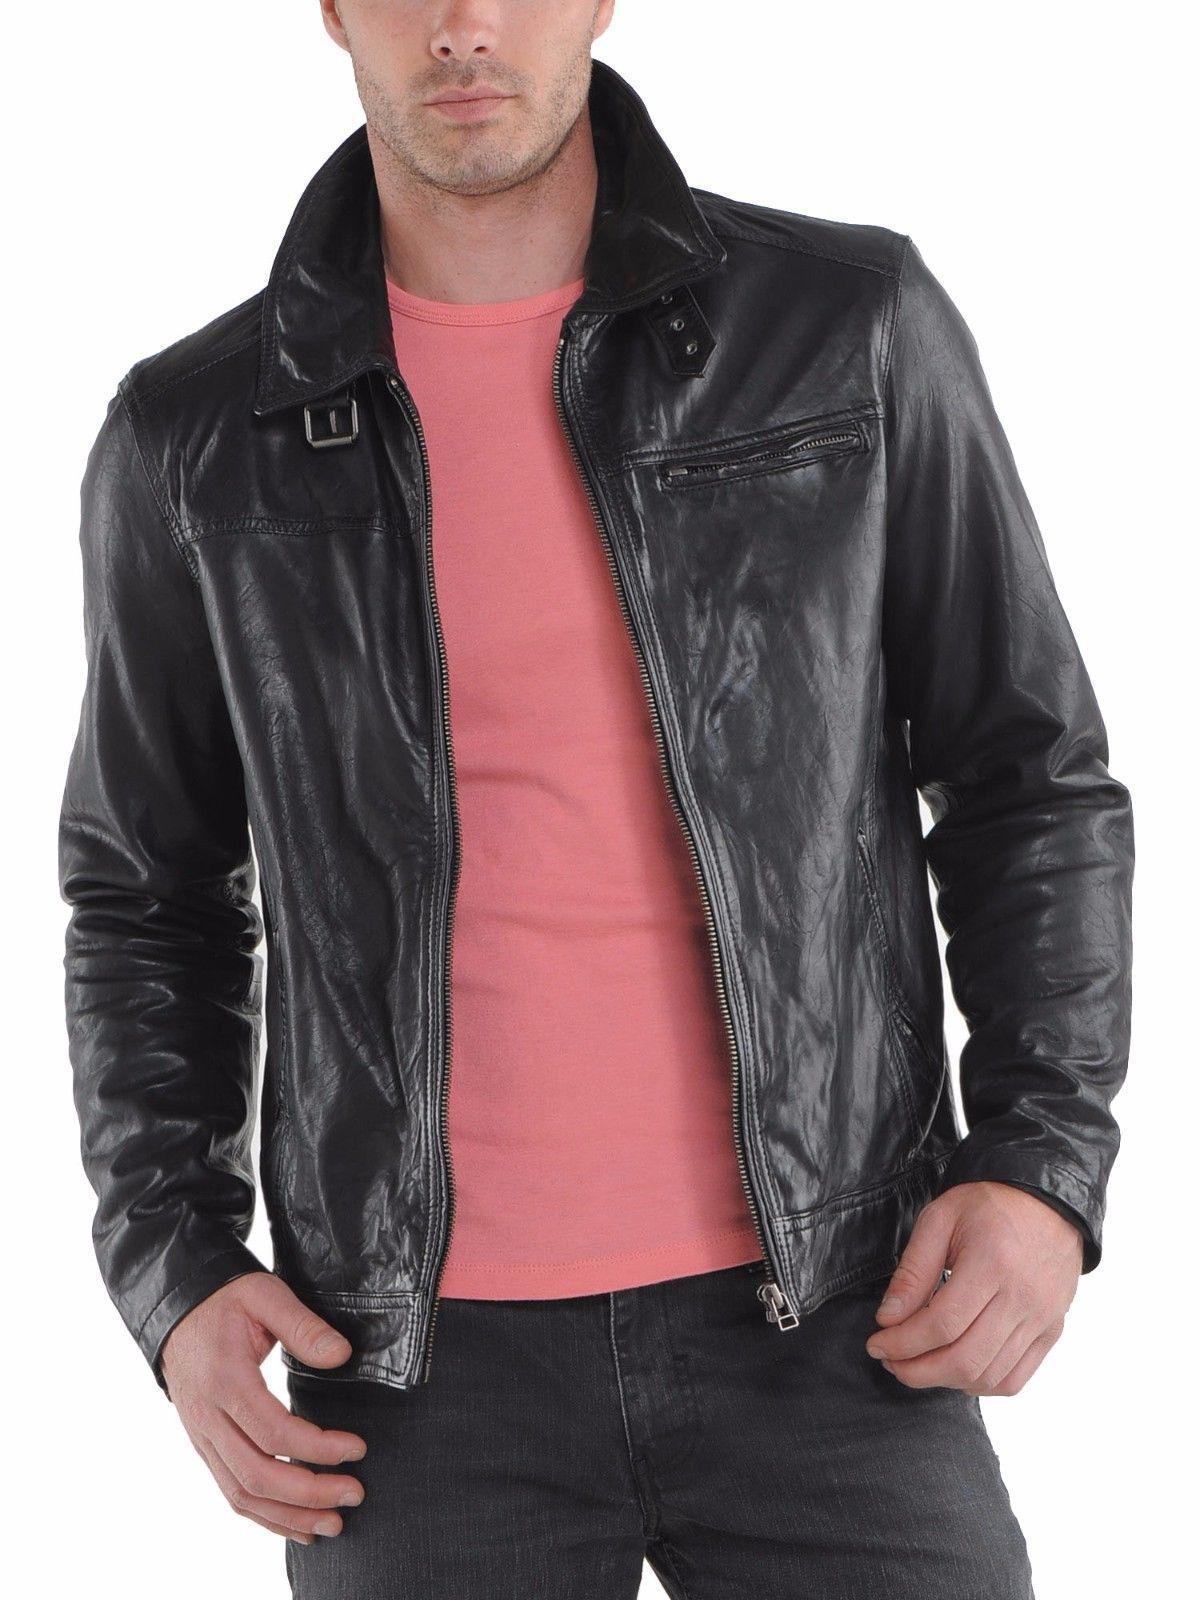 New Handmade Men Fashion Cowhide Jacket Biker Leather Fashion Jacket For Men Bonanzaleathersplane Leather Jacket Men Mens Leather Jacket Biker Leather Jacket [ 1600 x 1200 Pixel ]